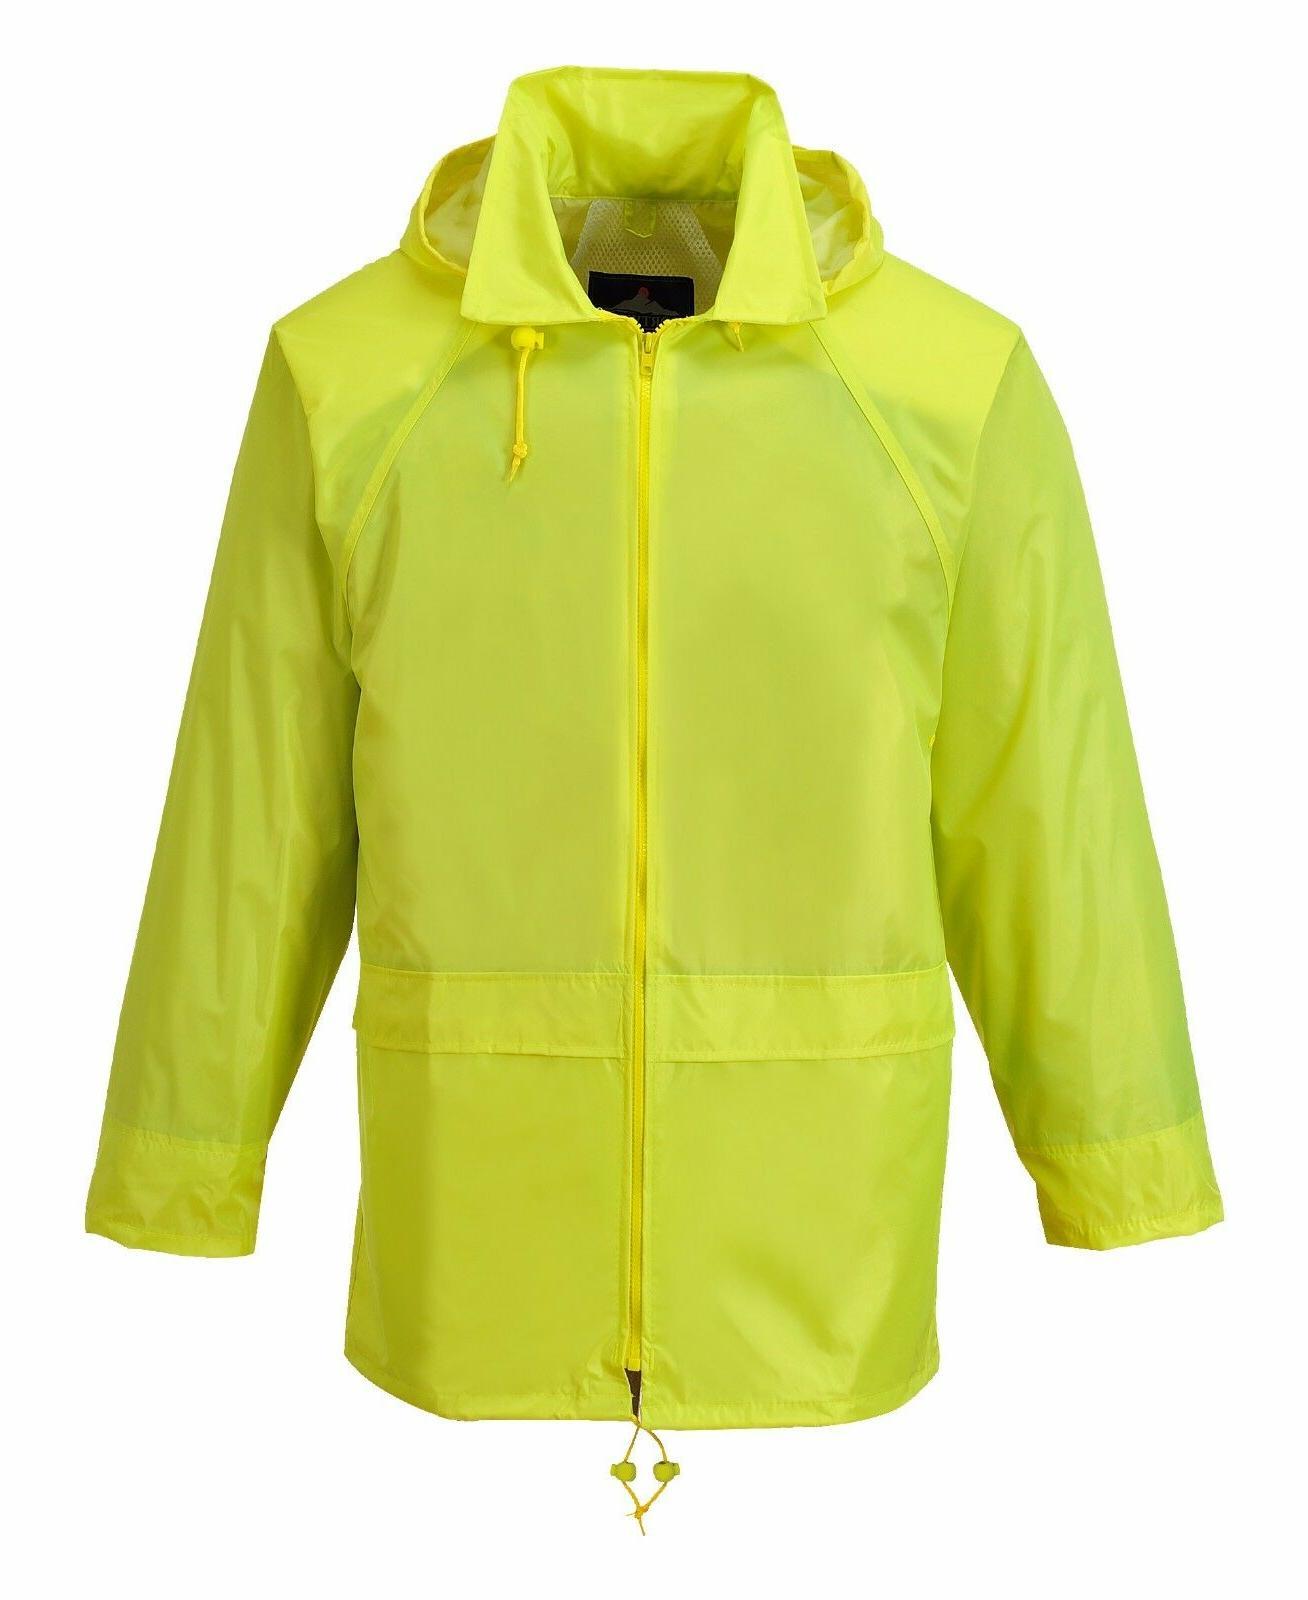 Portwest Jacket, Waterproof Outdoor with Hood